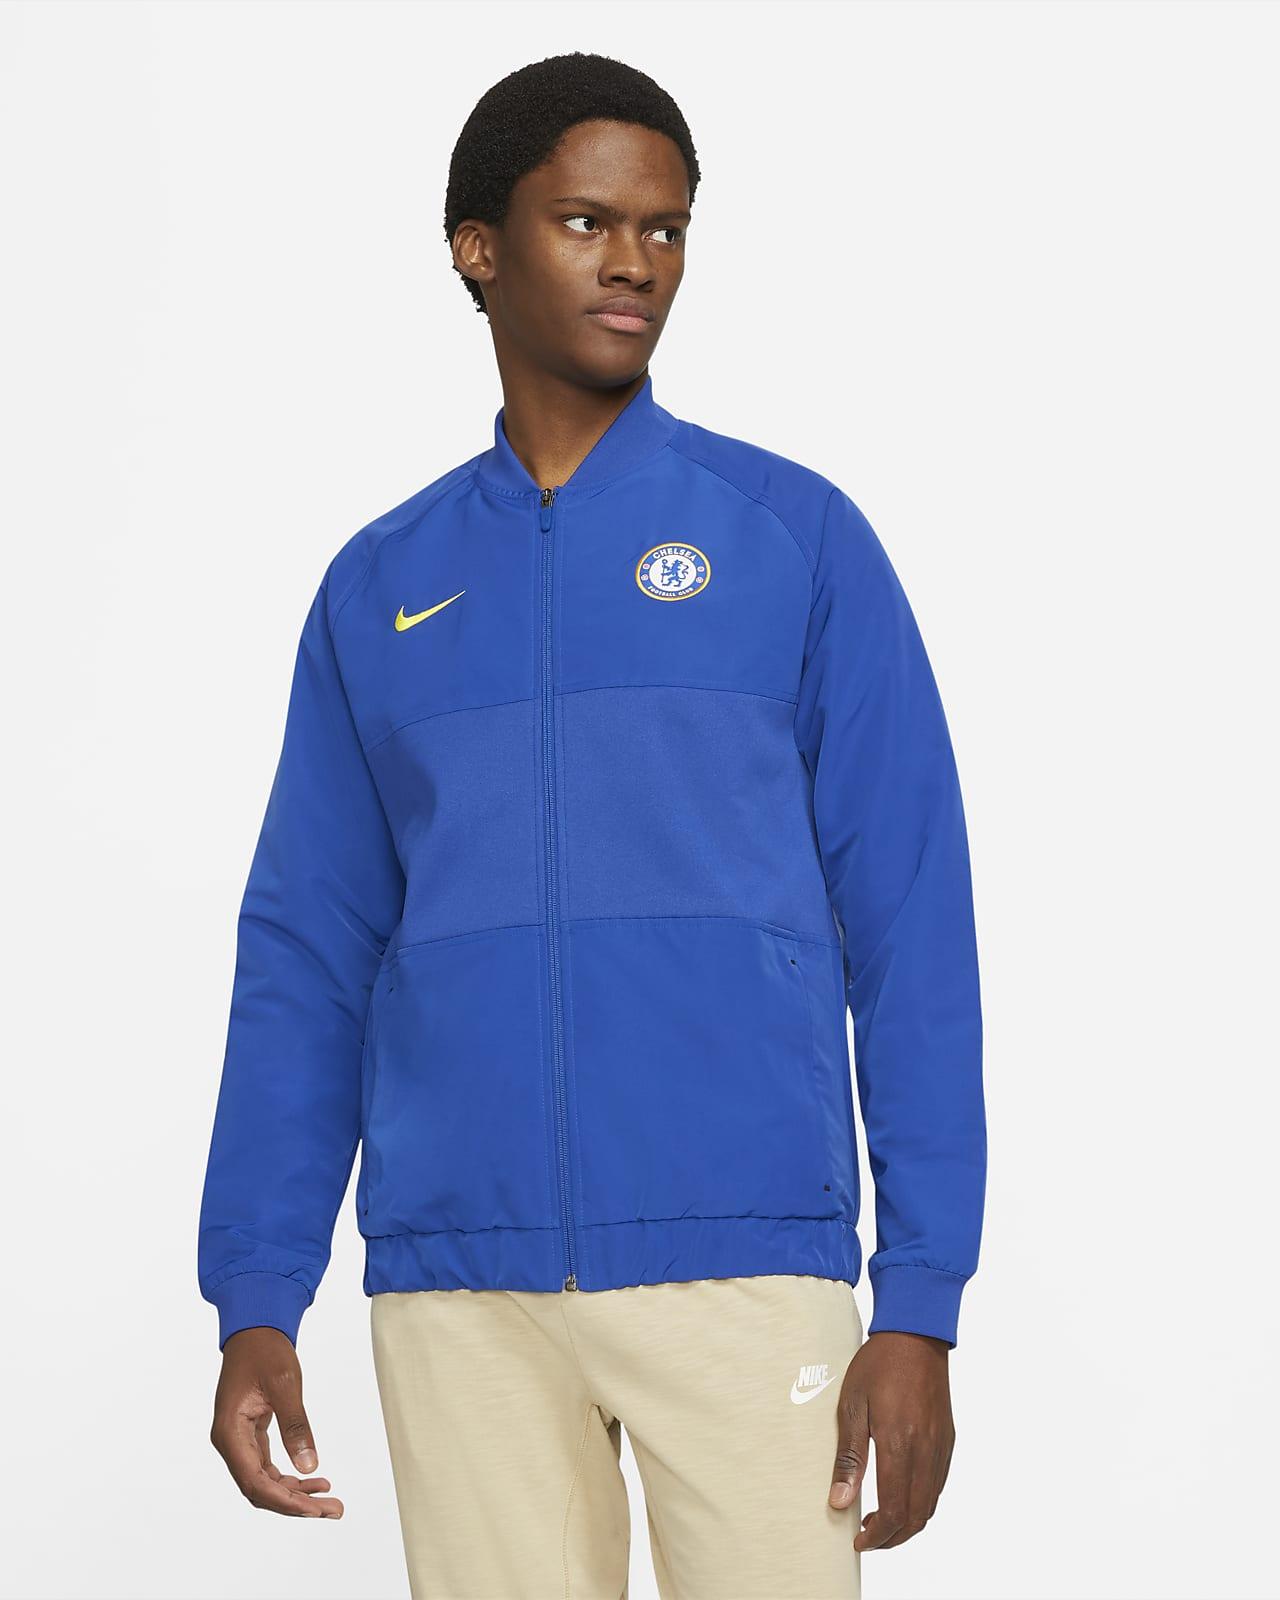 Chelsea F.C. Men's Nike Dri-FIT Full-Zip Football Jacket